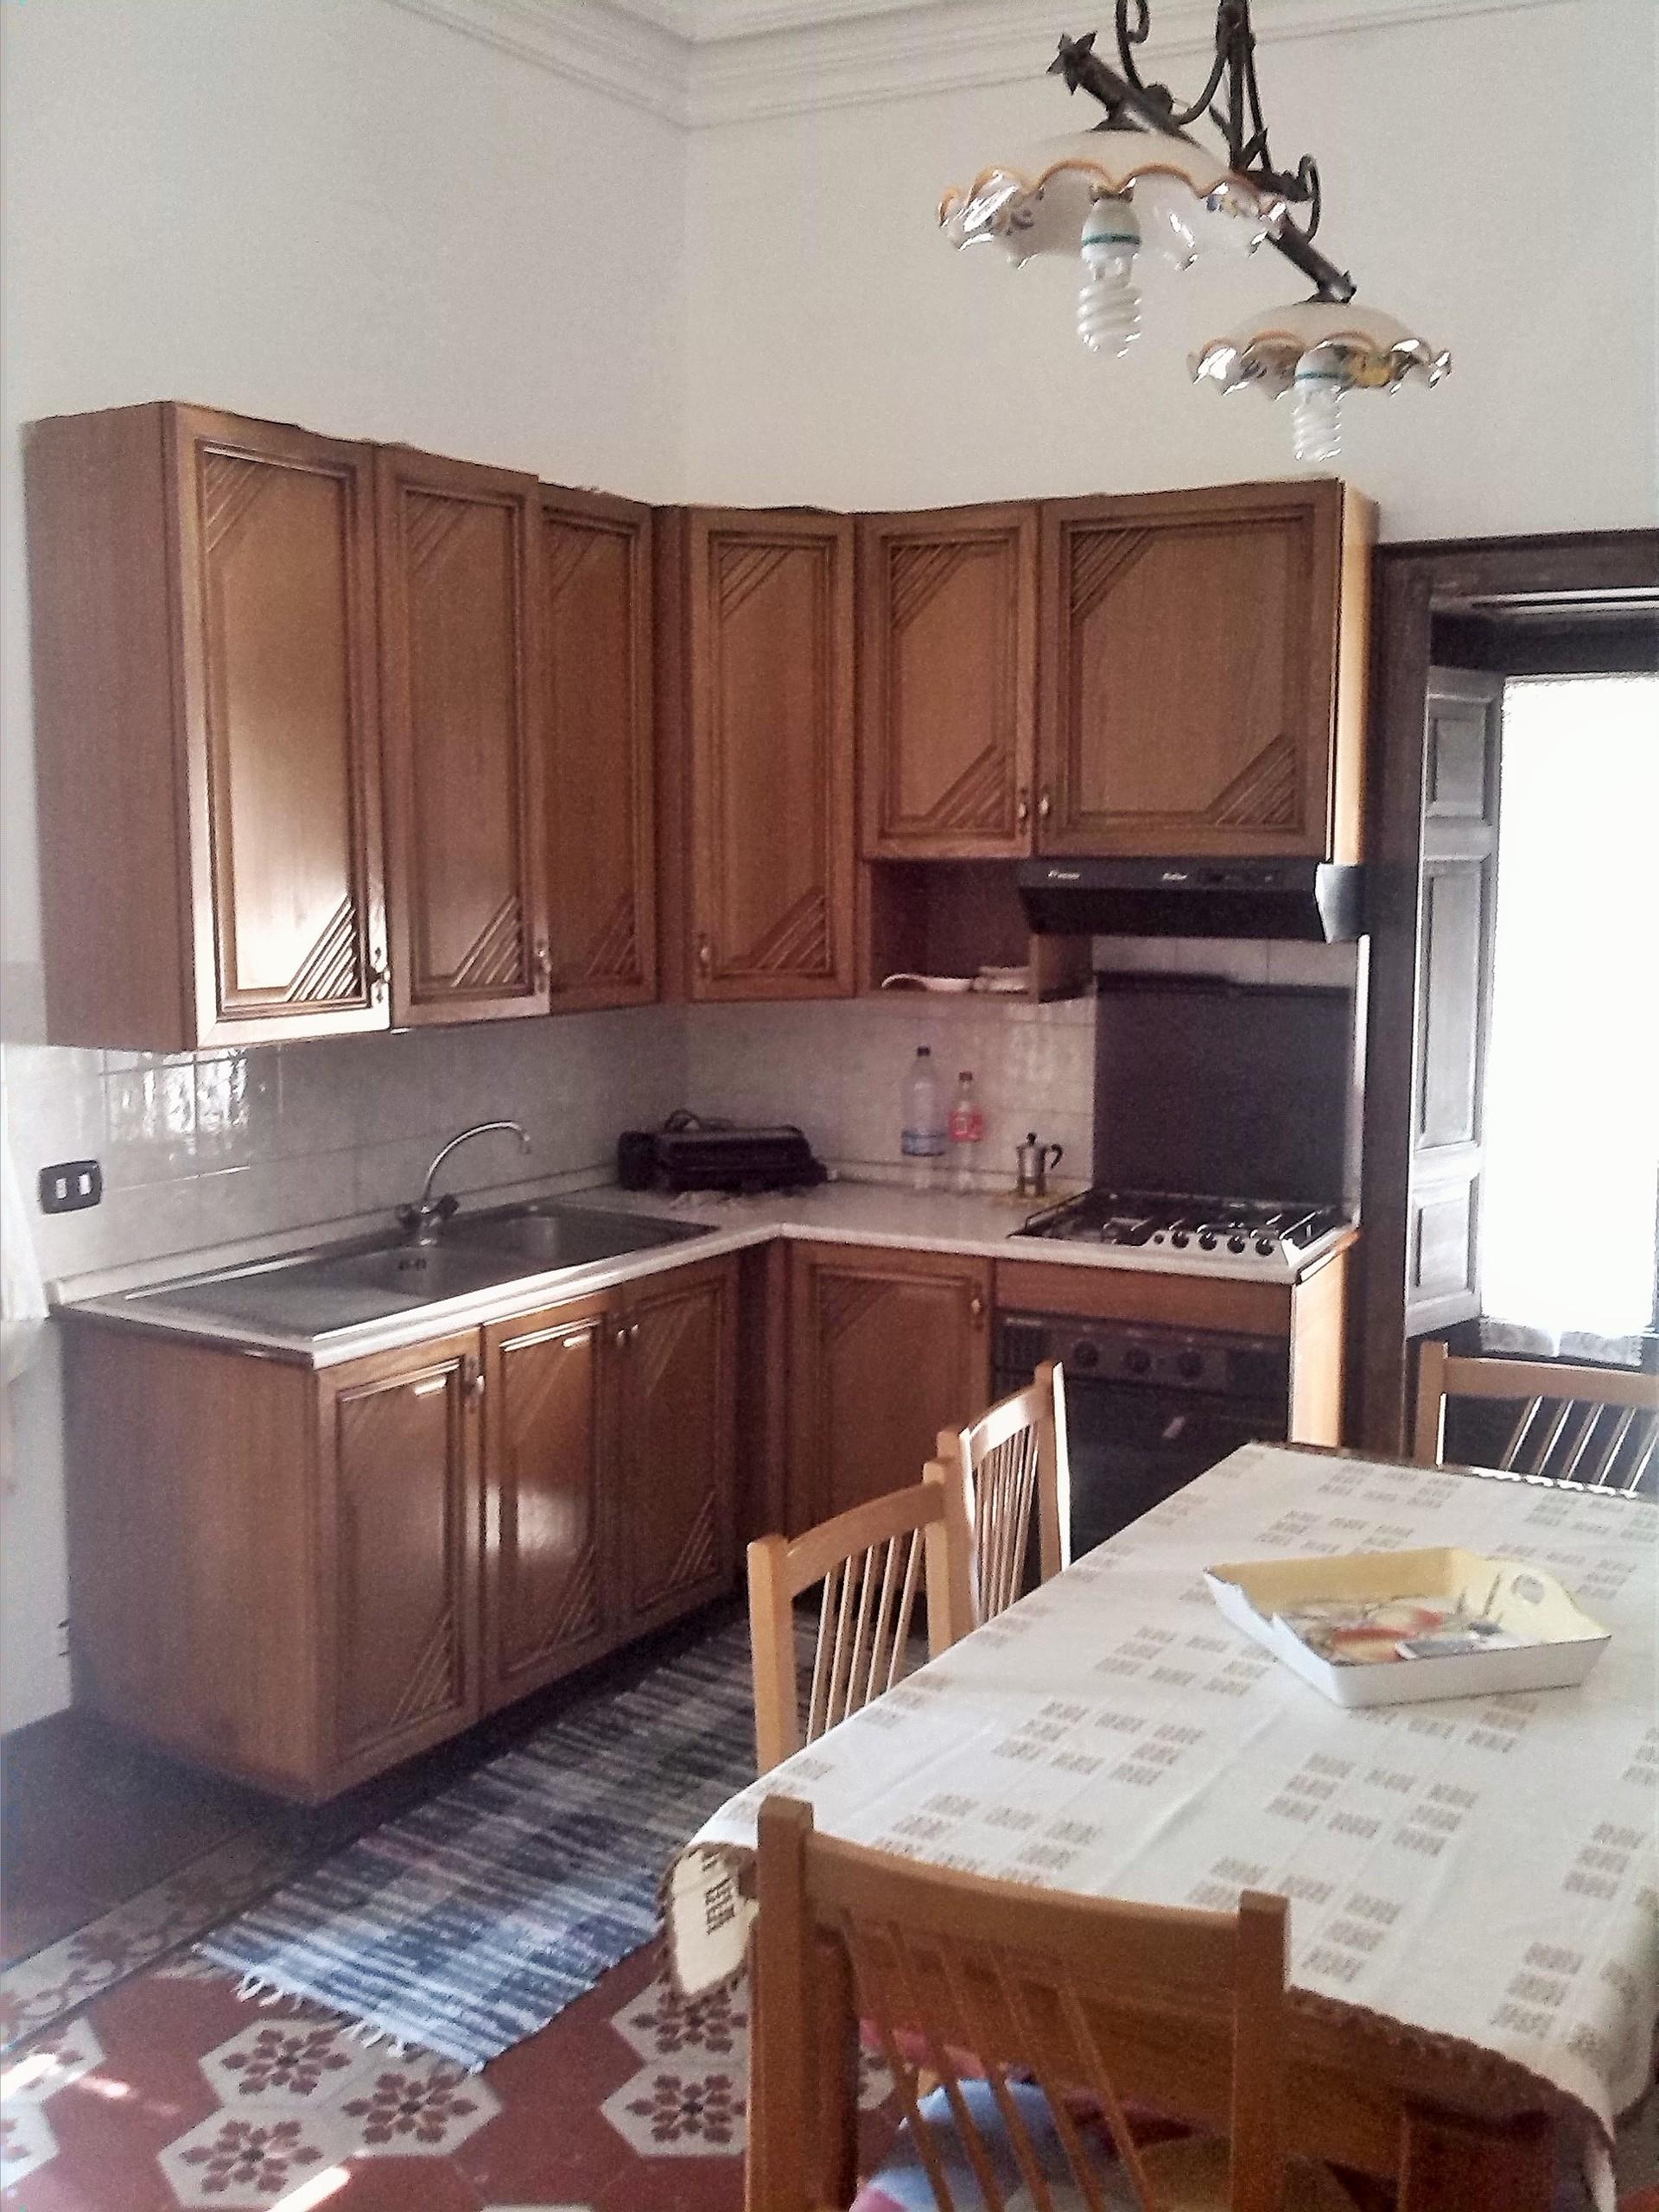 stanze-in-affitto-in-via-garibaldi-catania-d05b337730ef7a3ffbba4cea437d3db6